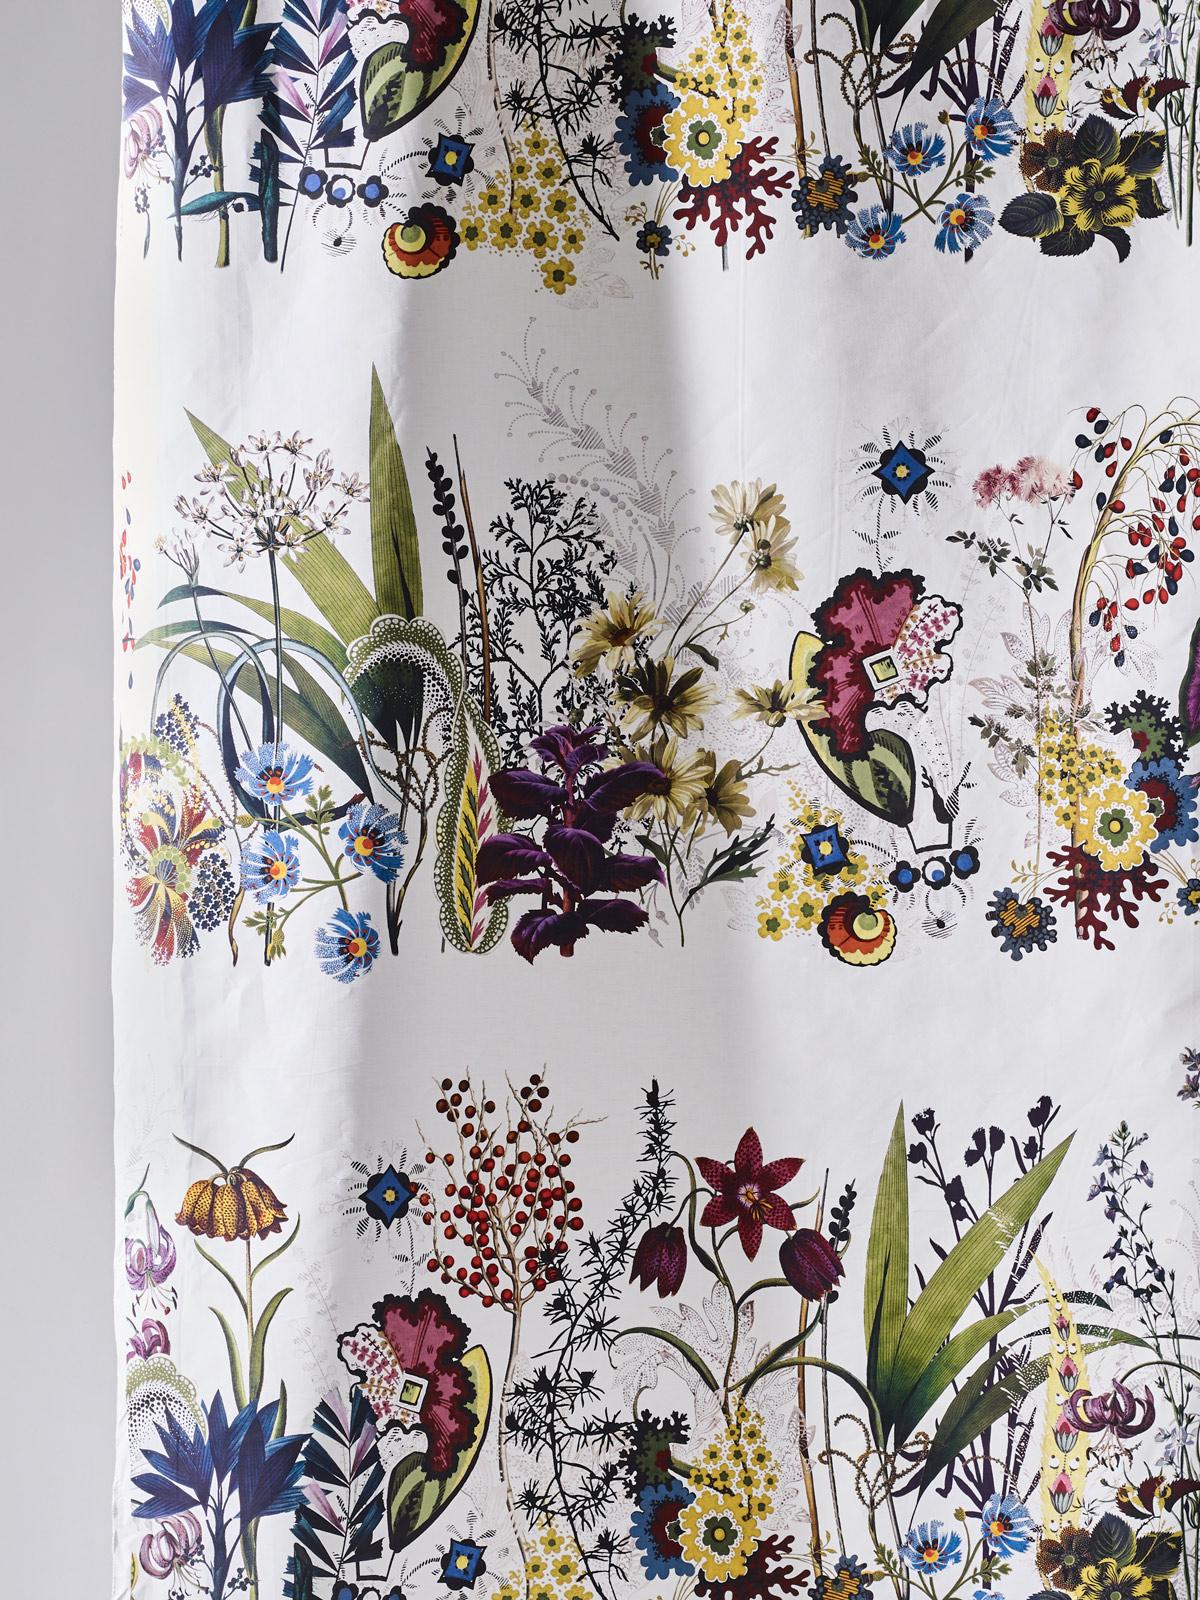 bernhard duss-jakob schlaepfer-colours-textiledesign-fabrics-designer-custom made fabrics-textileprint-interior fabrics-inkjetprint-print on cotton